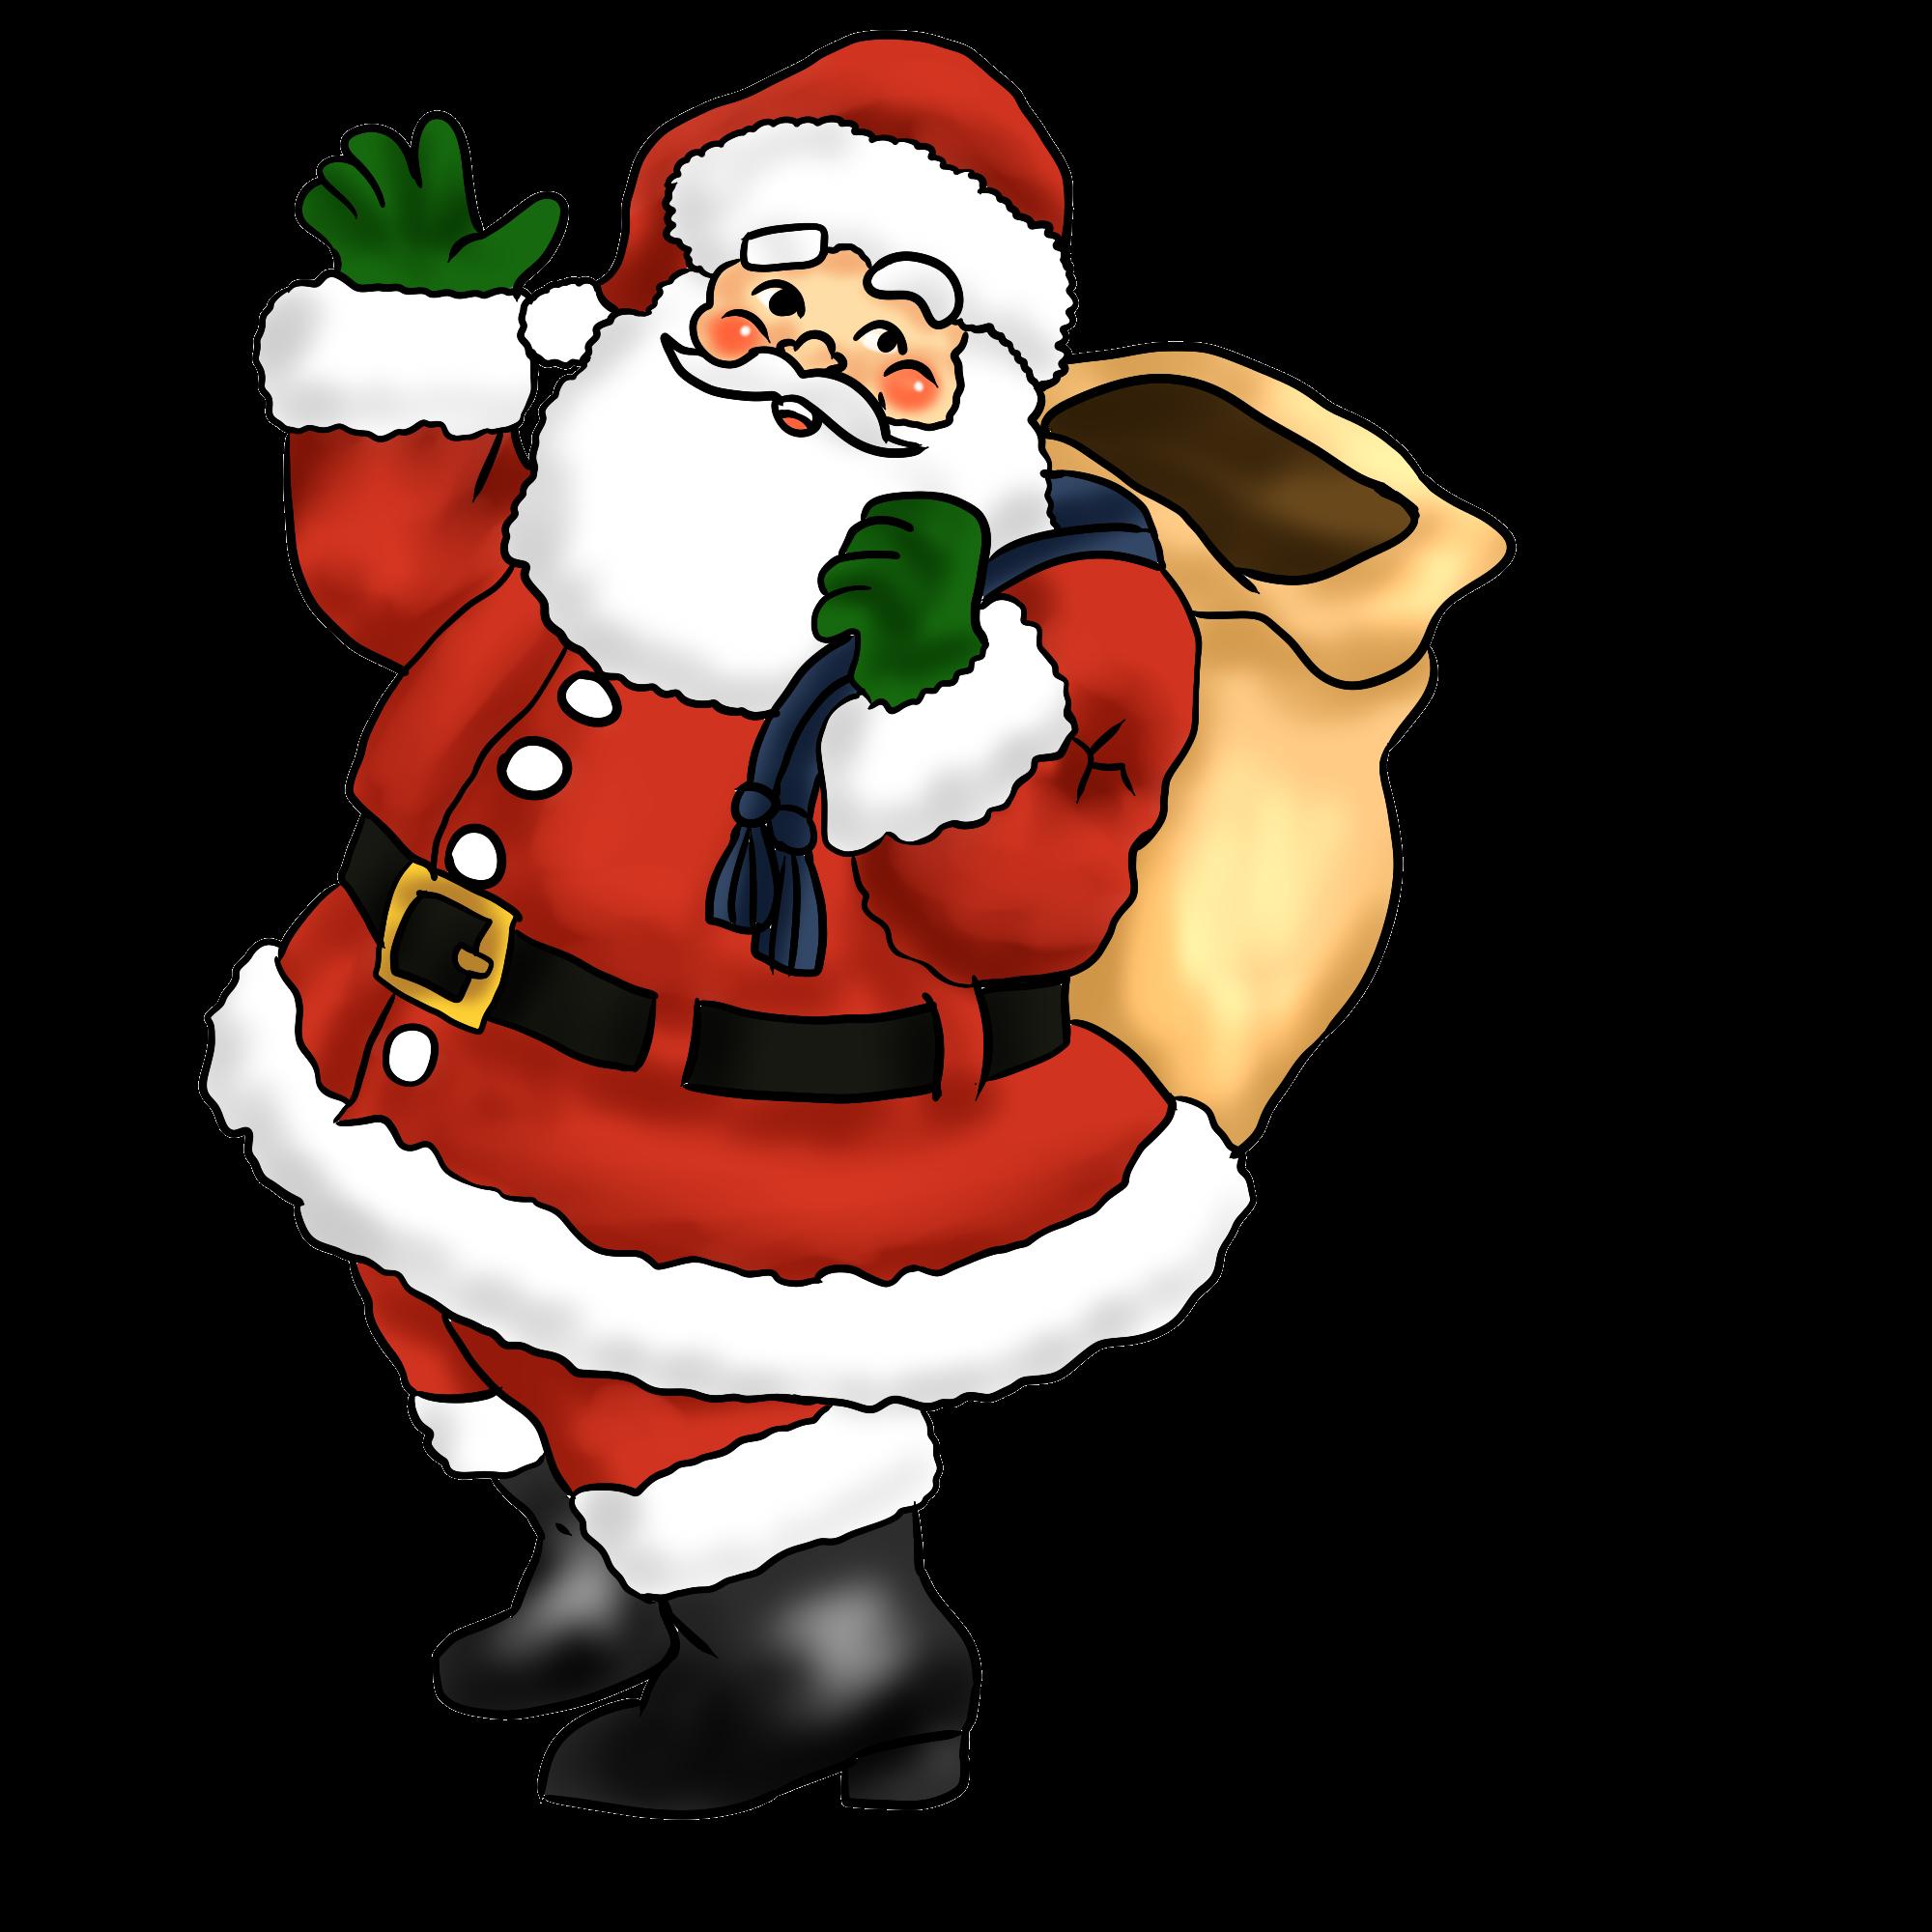 2000x2000 Santa Images Clip Art Free Many Interesting Cliparts